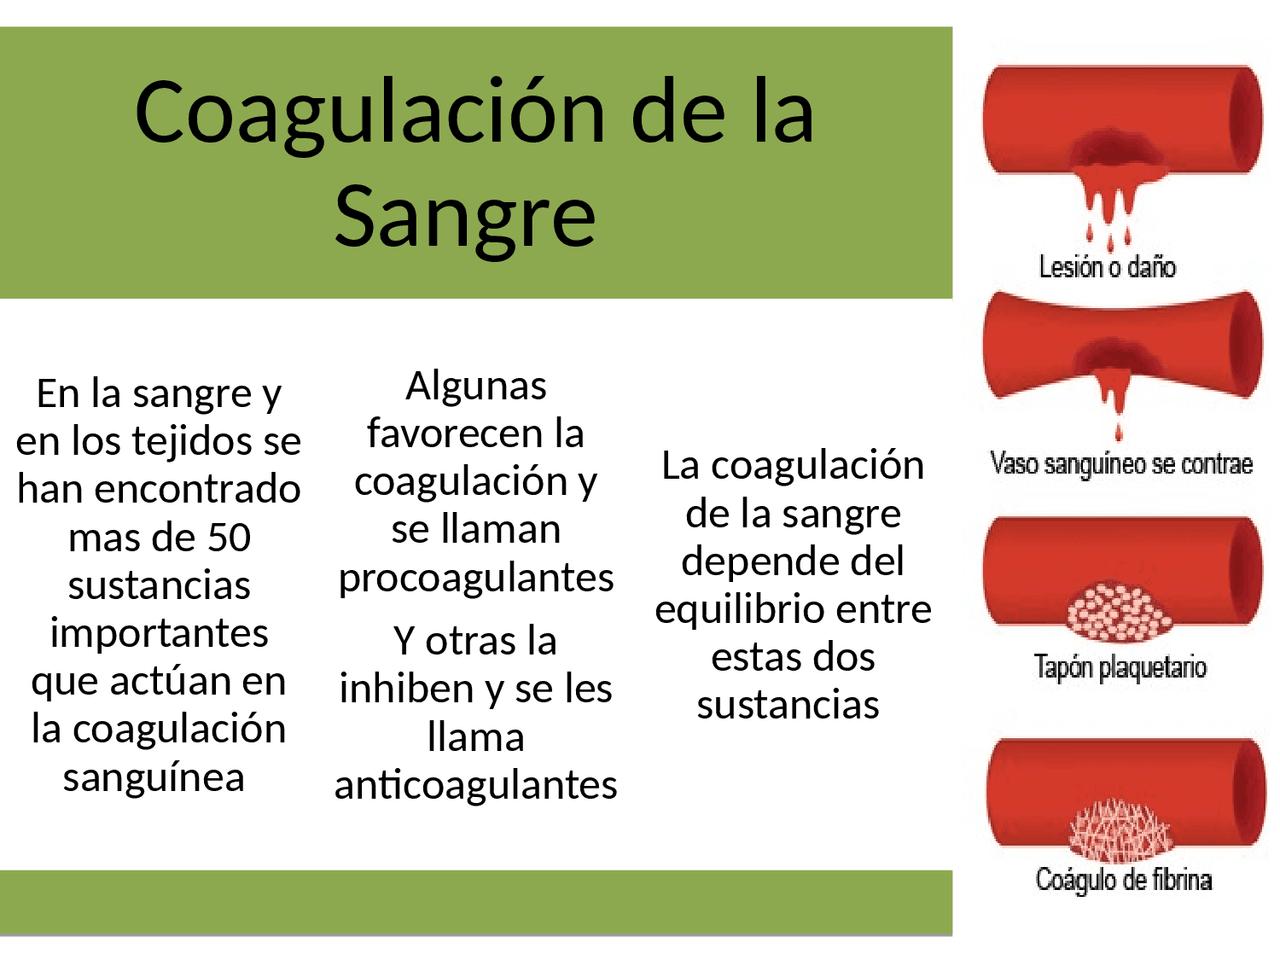 Coagulacion de la sangre - Docsity